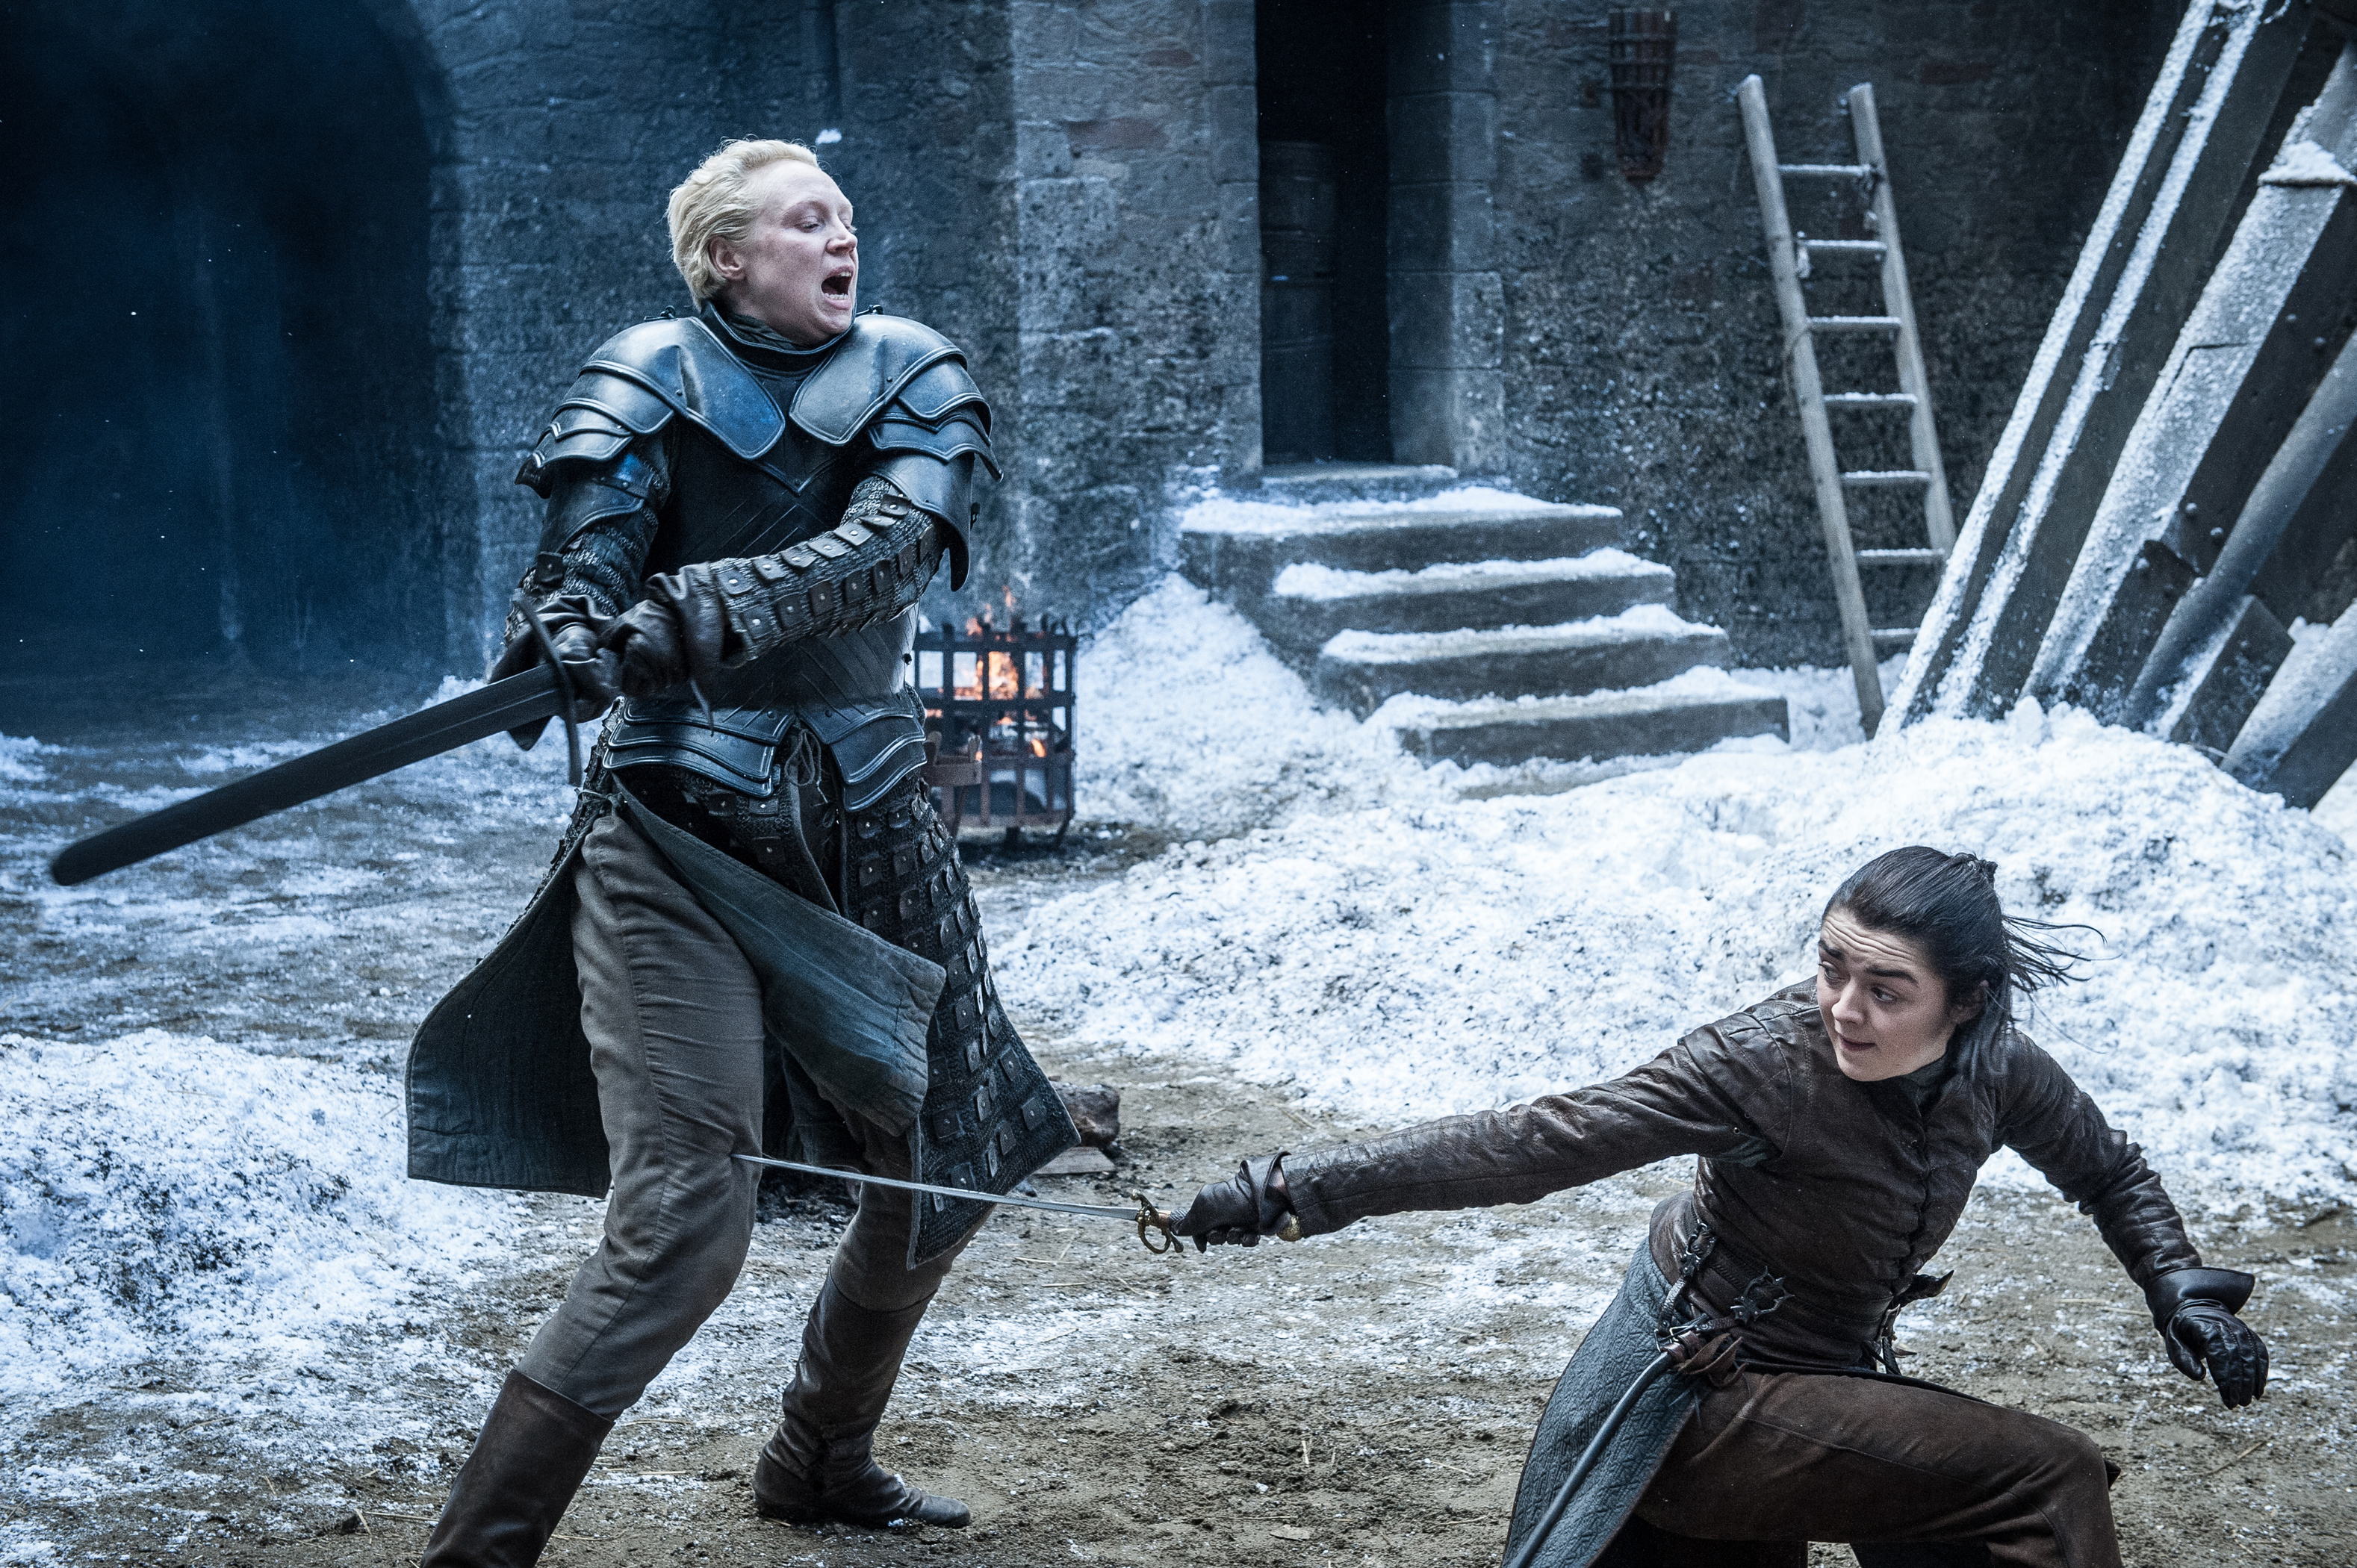 Game of Thrones Season 7 Episode 4 Brienne Arya